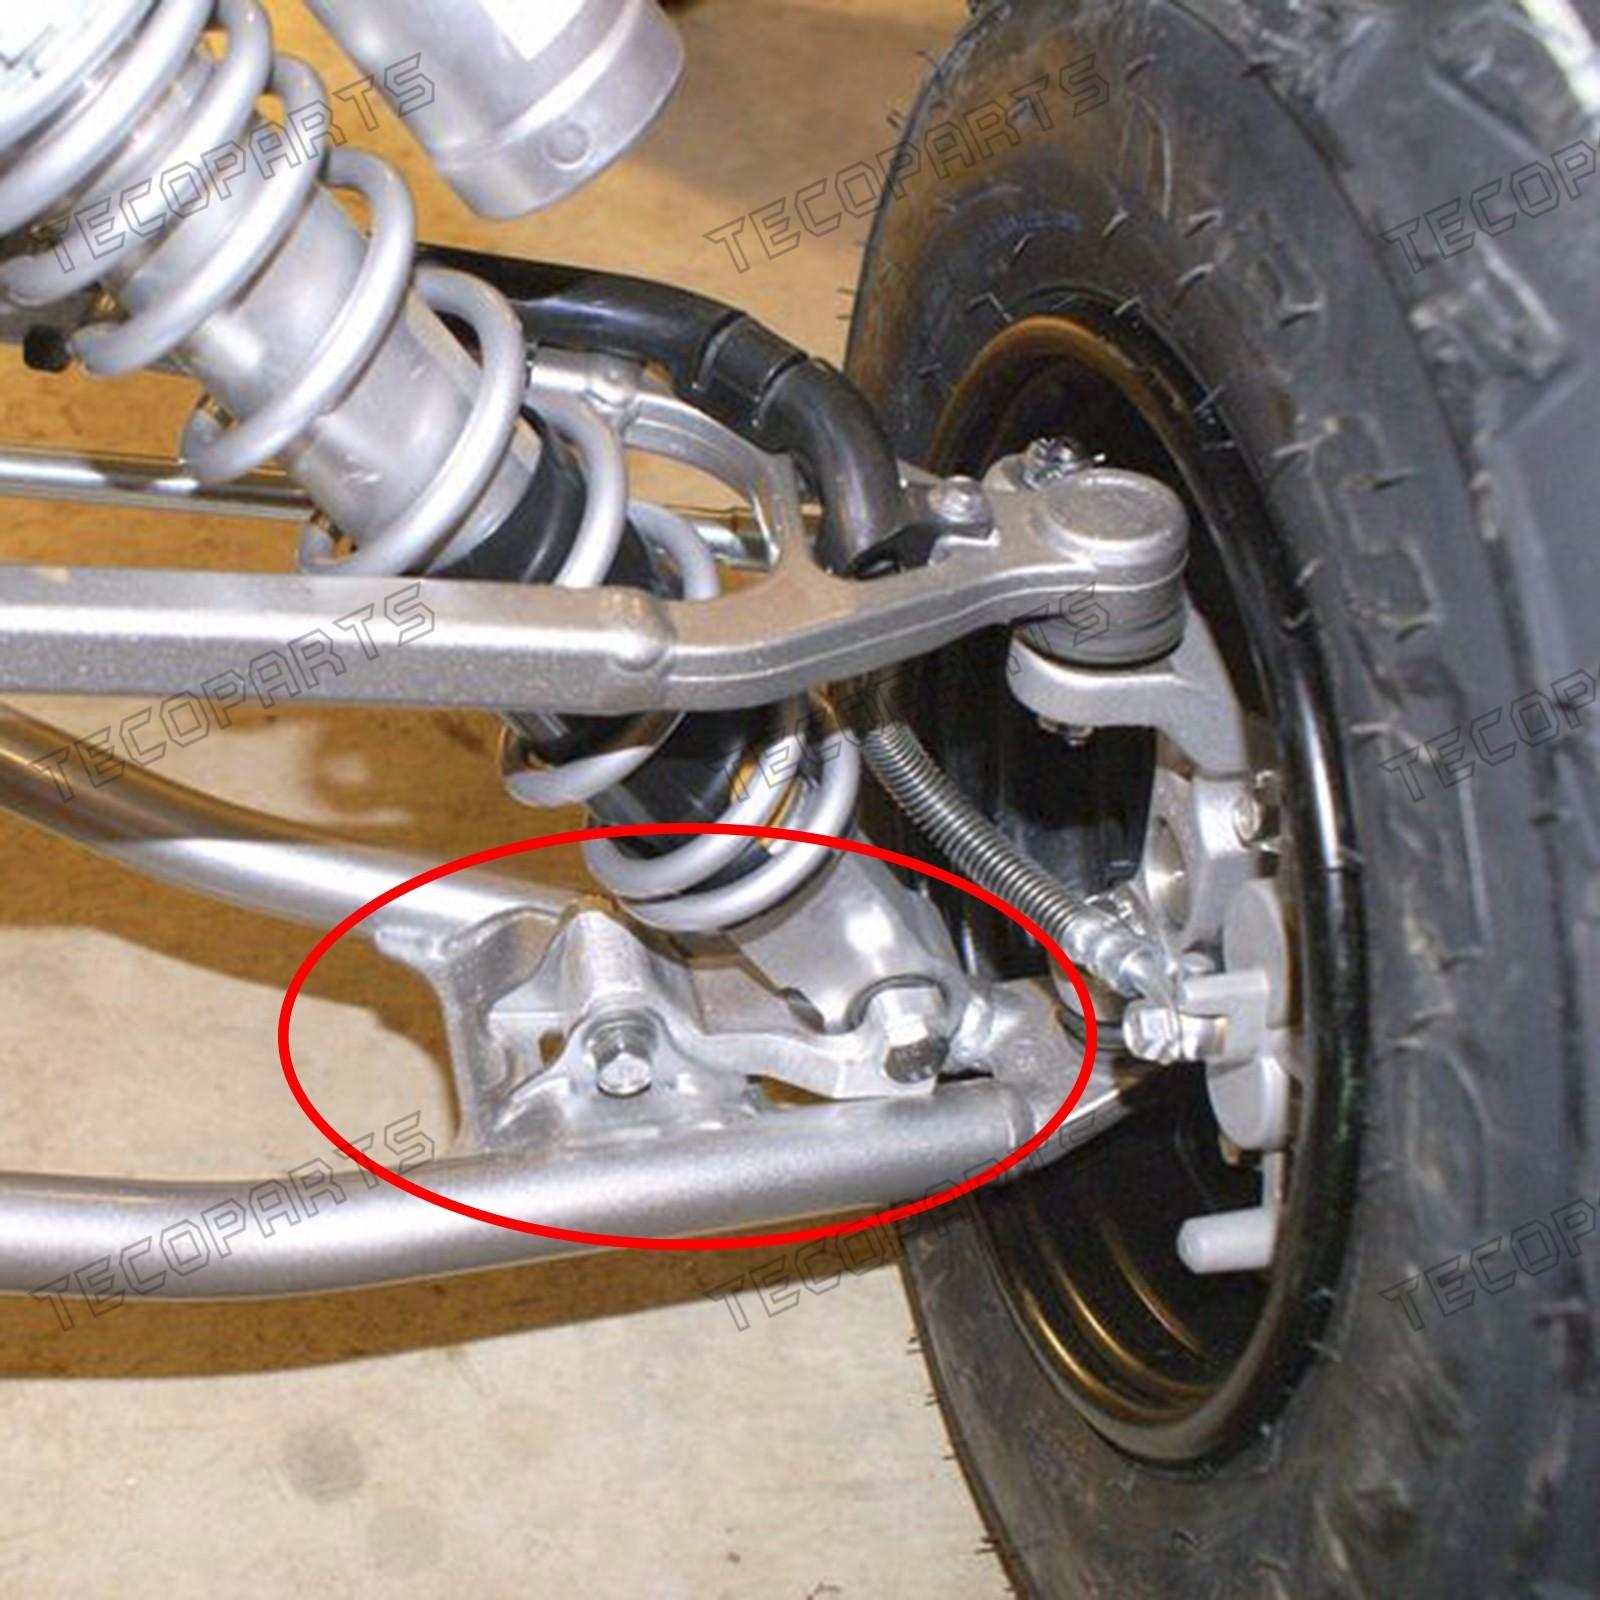 Atv Cnc 3 5 Quot Front Lowering Kit For Honda Trx400ex 450r